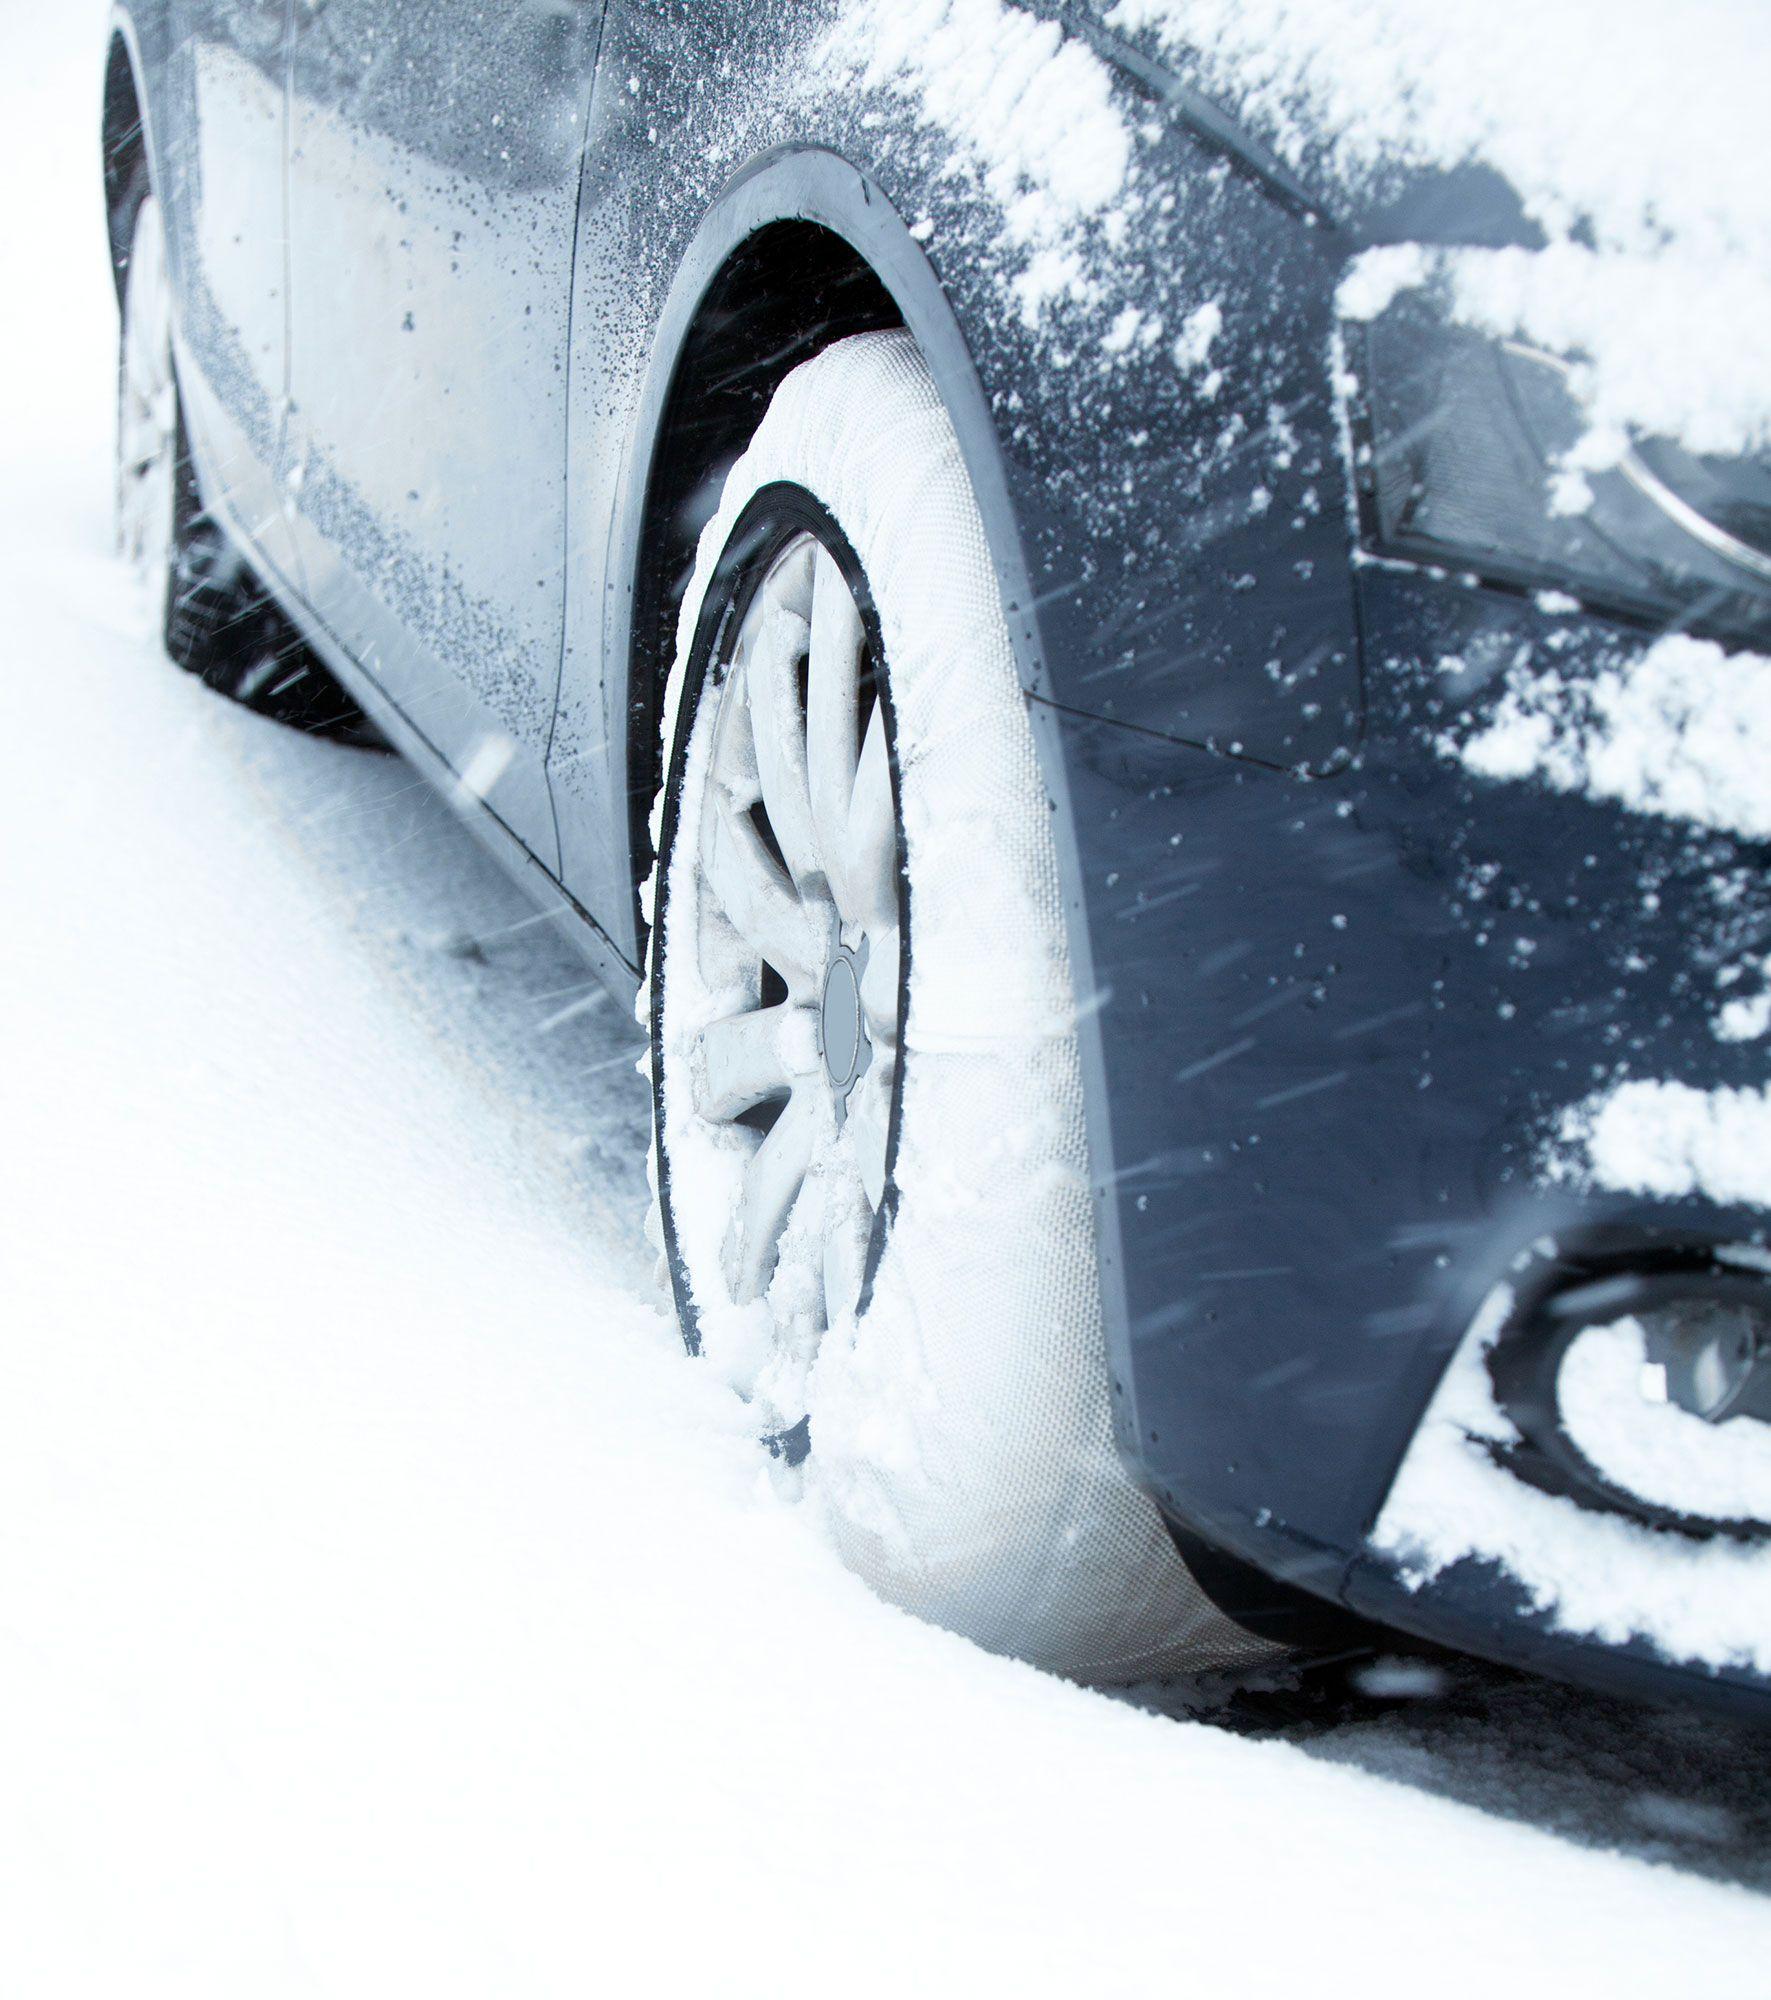 poner cadenas textiles nieve coche